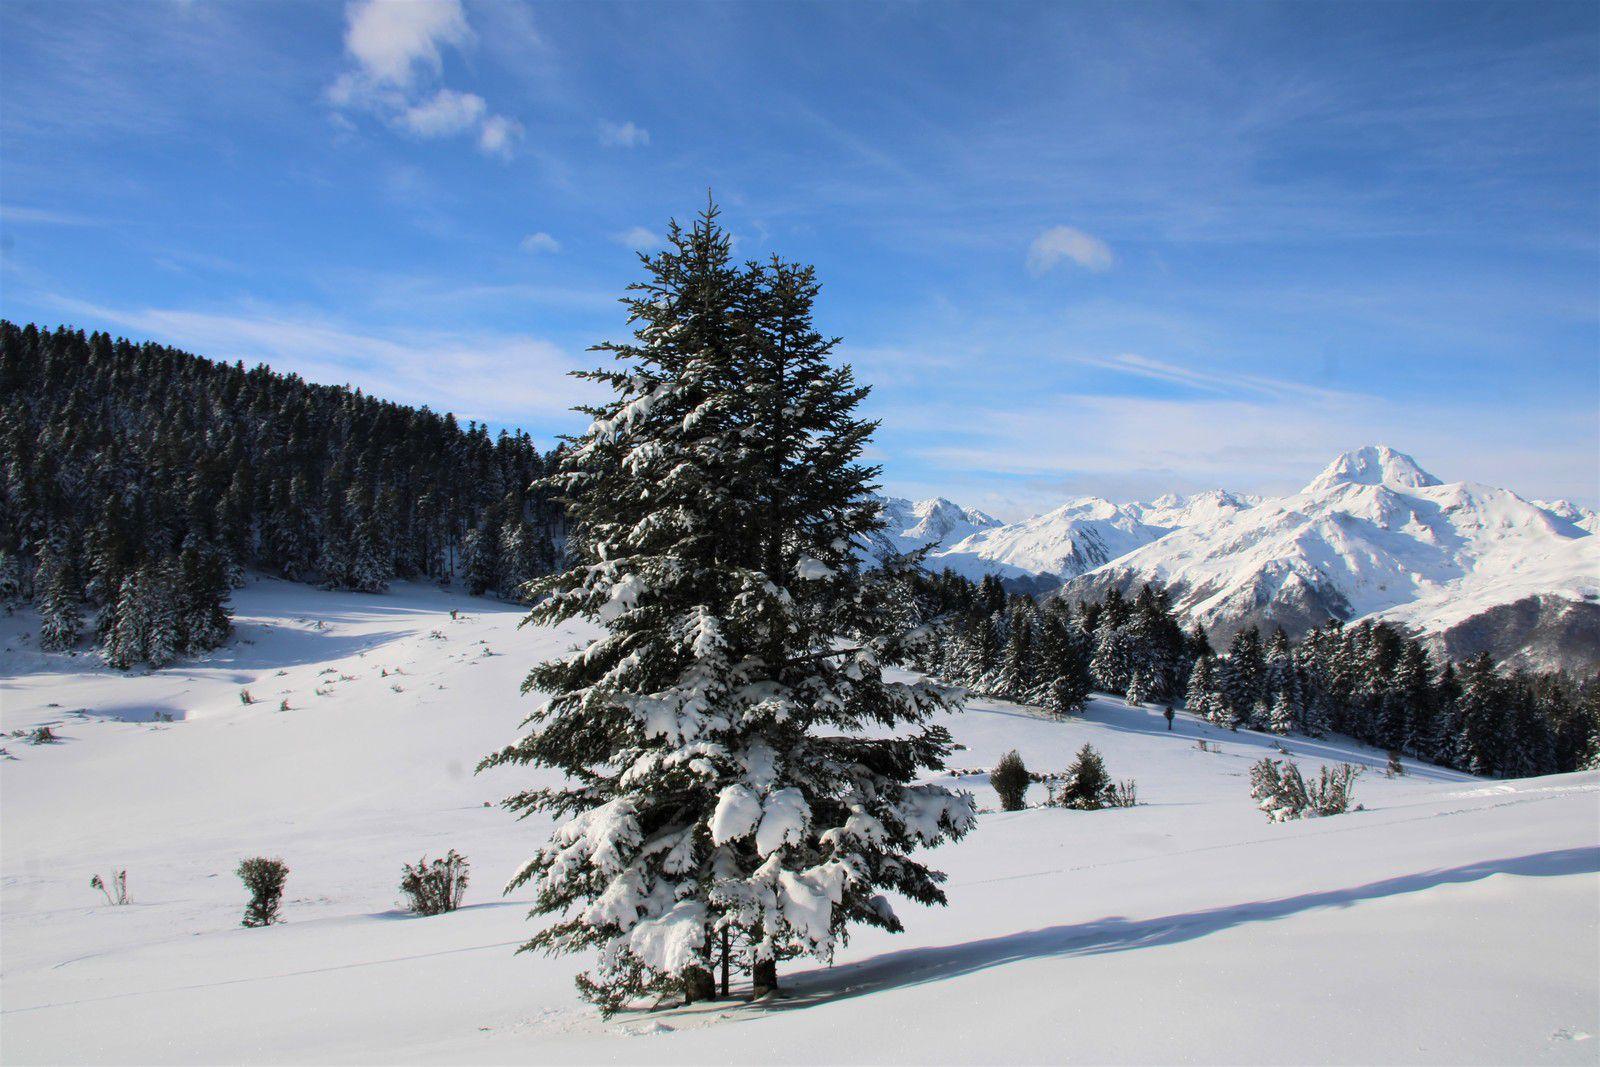 Vers le pic du Midi de Bigorre.